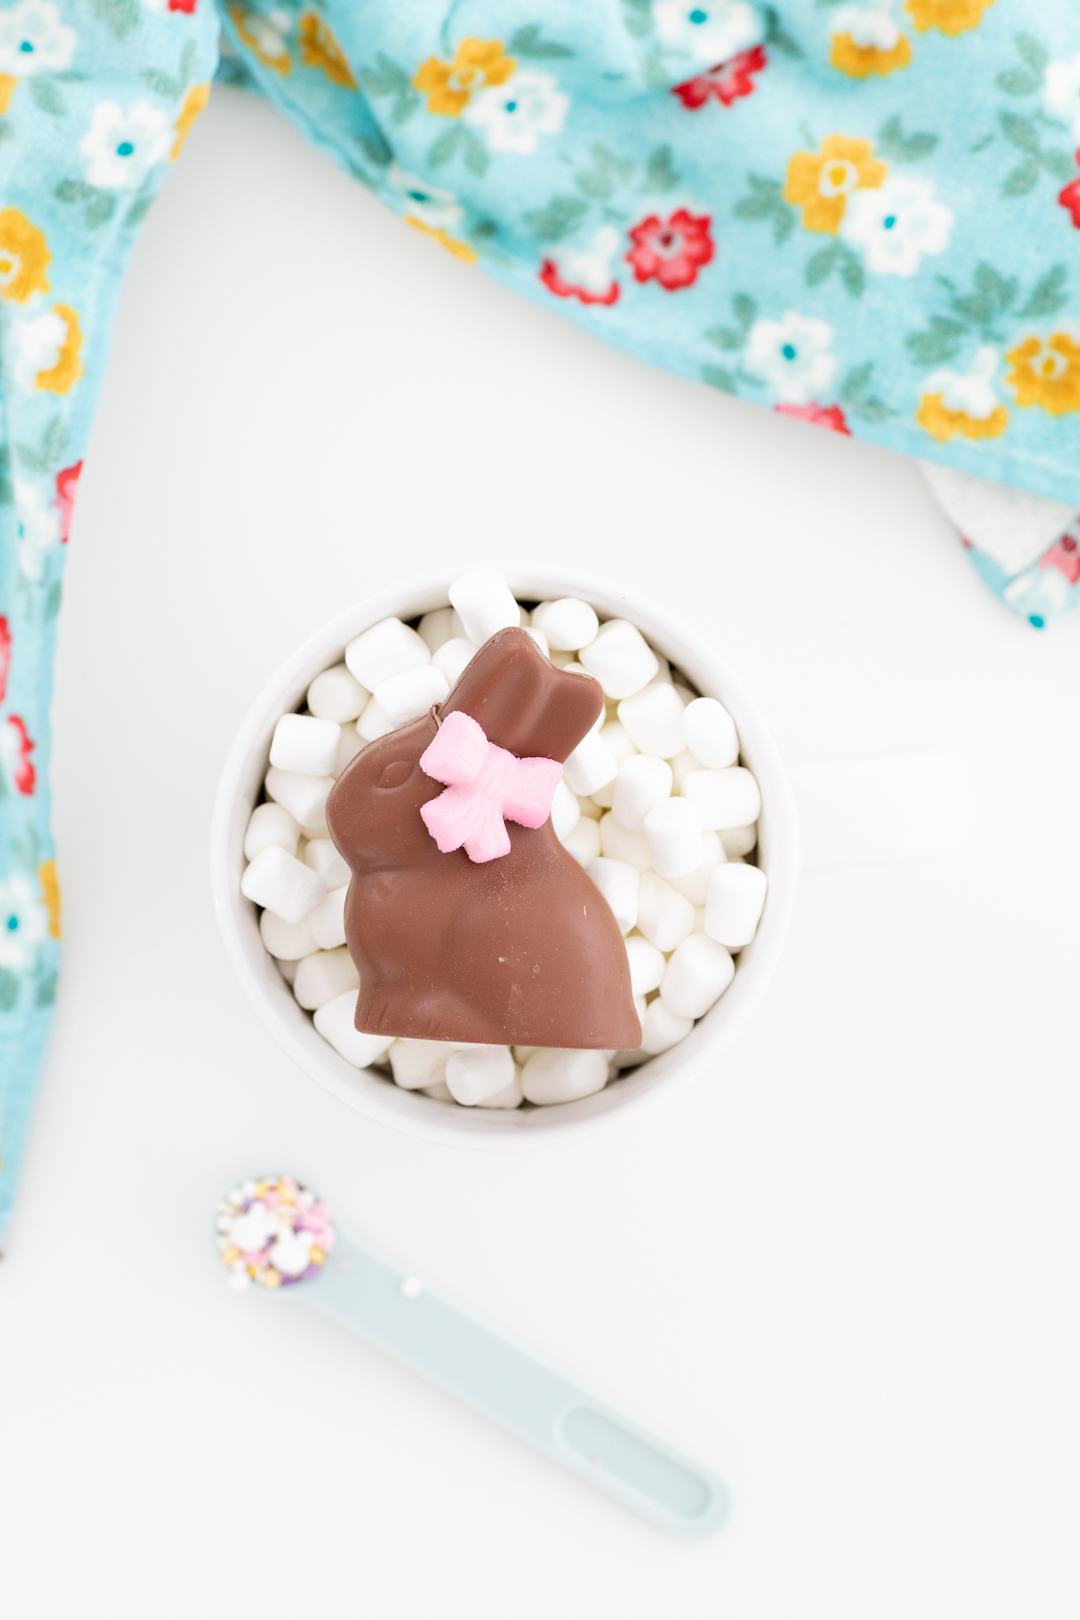 chocolate bunny inside a large mug loaded with mini marshmallows